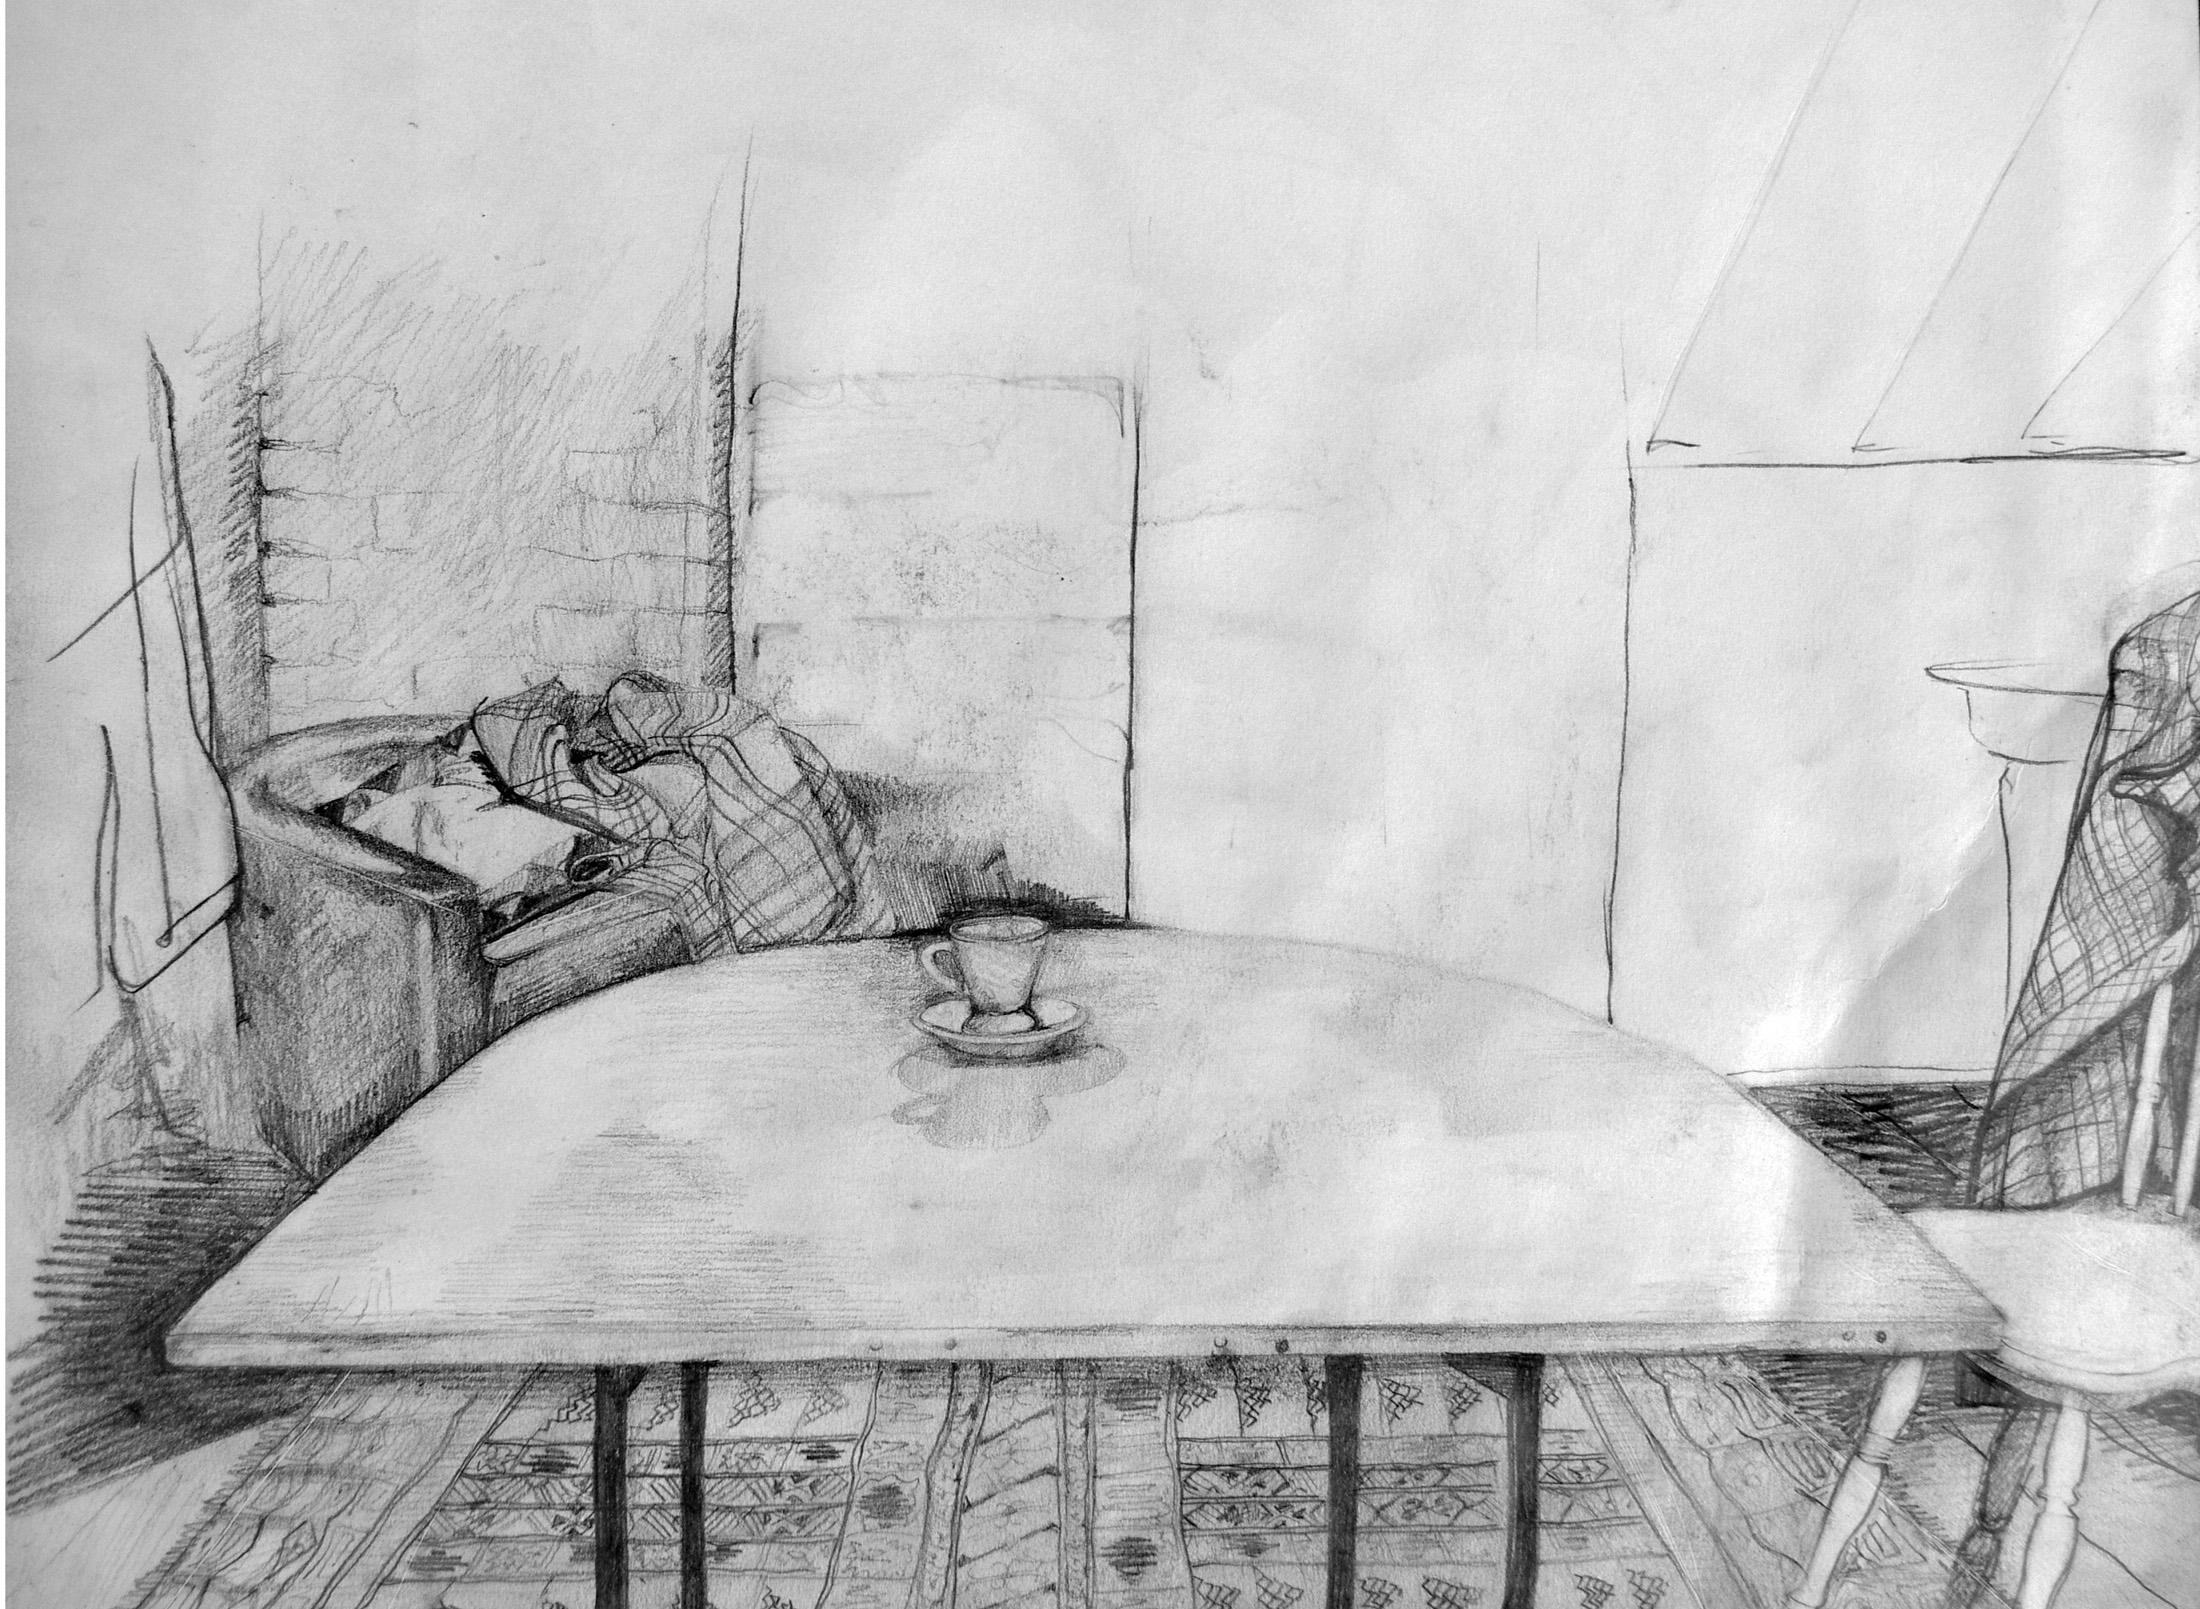 6. Untitled_30x37_pencil on paper jpg.jpg